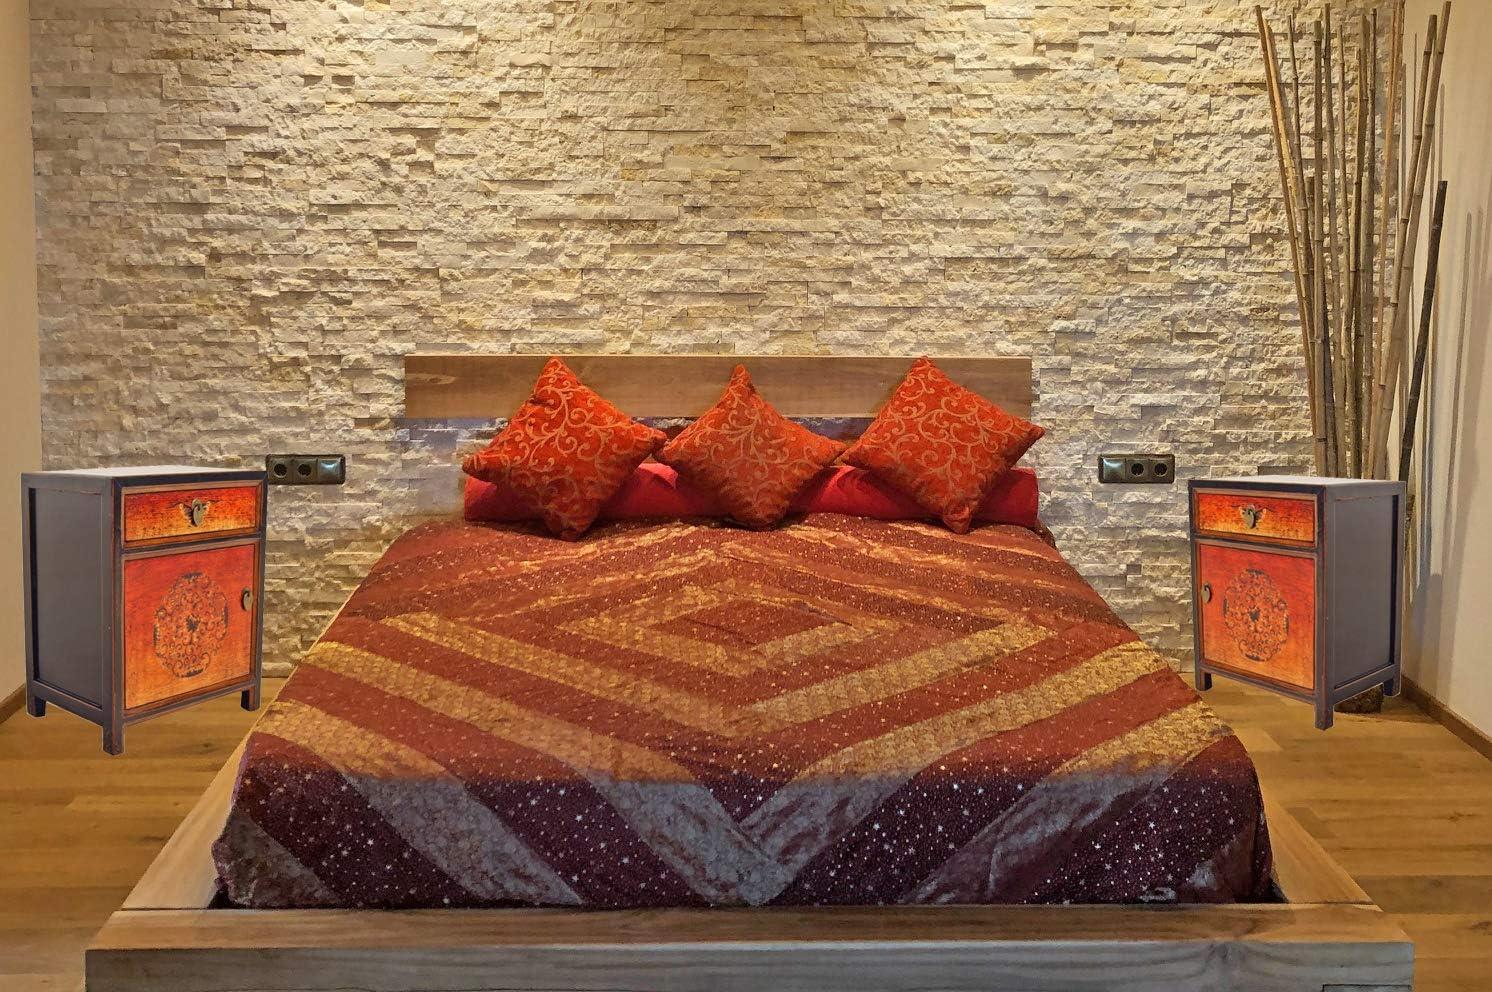 OPIUM OUTLET Mesita de Noche Dormitorio Vintage China Antigua Oriental Naranja, Comoda pequeña asiatica Entrada Madera